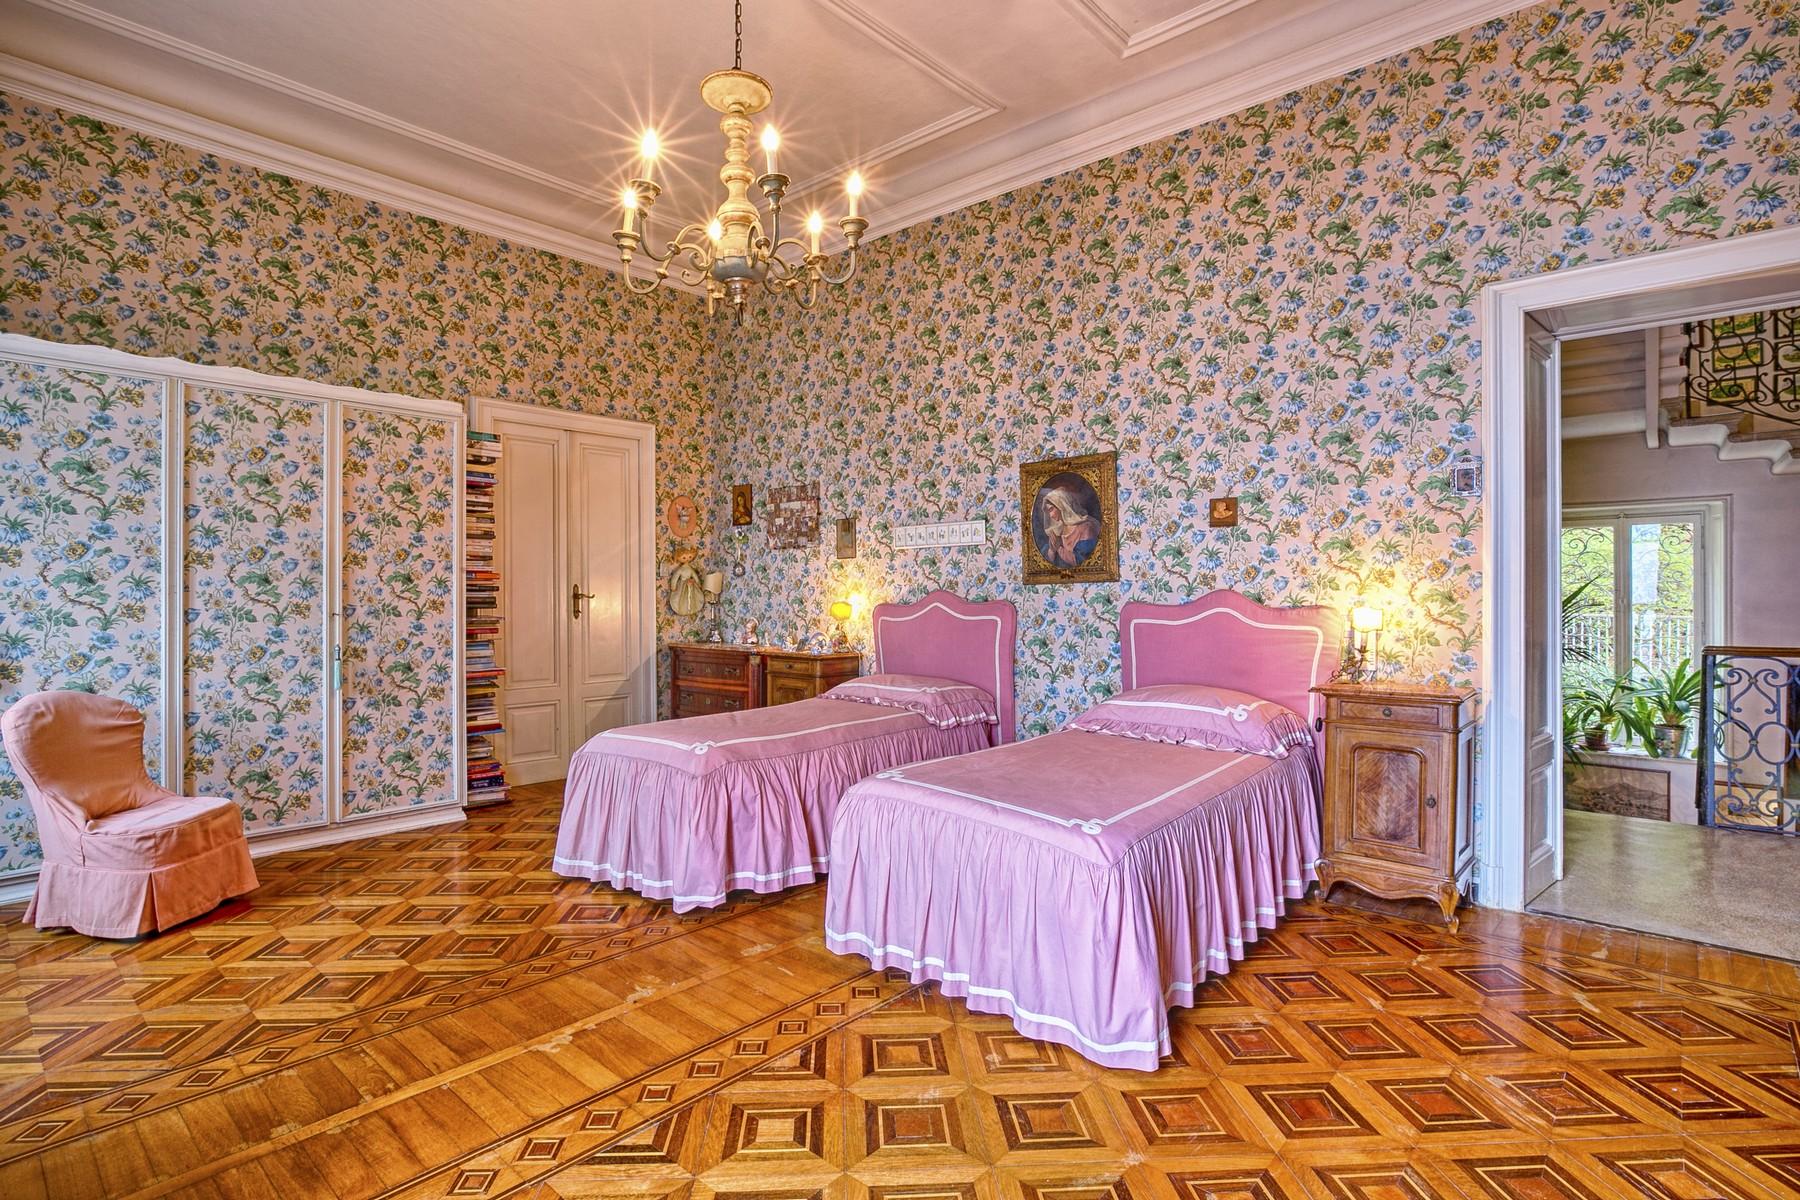 Villa in Vendita a Stresa: 5 locali, 800 mq - Foto 24